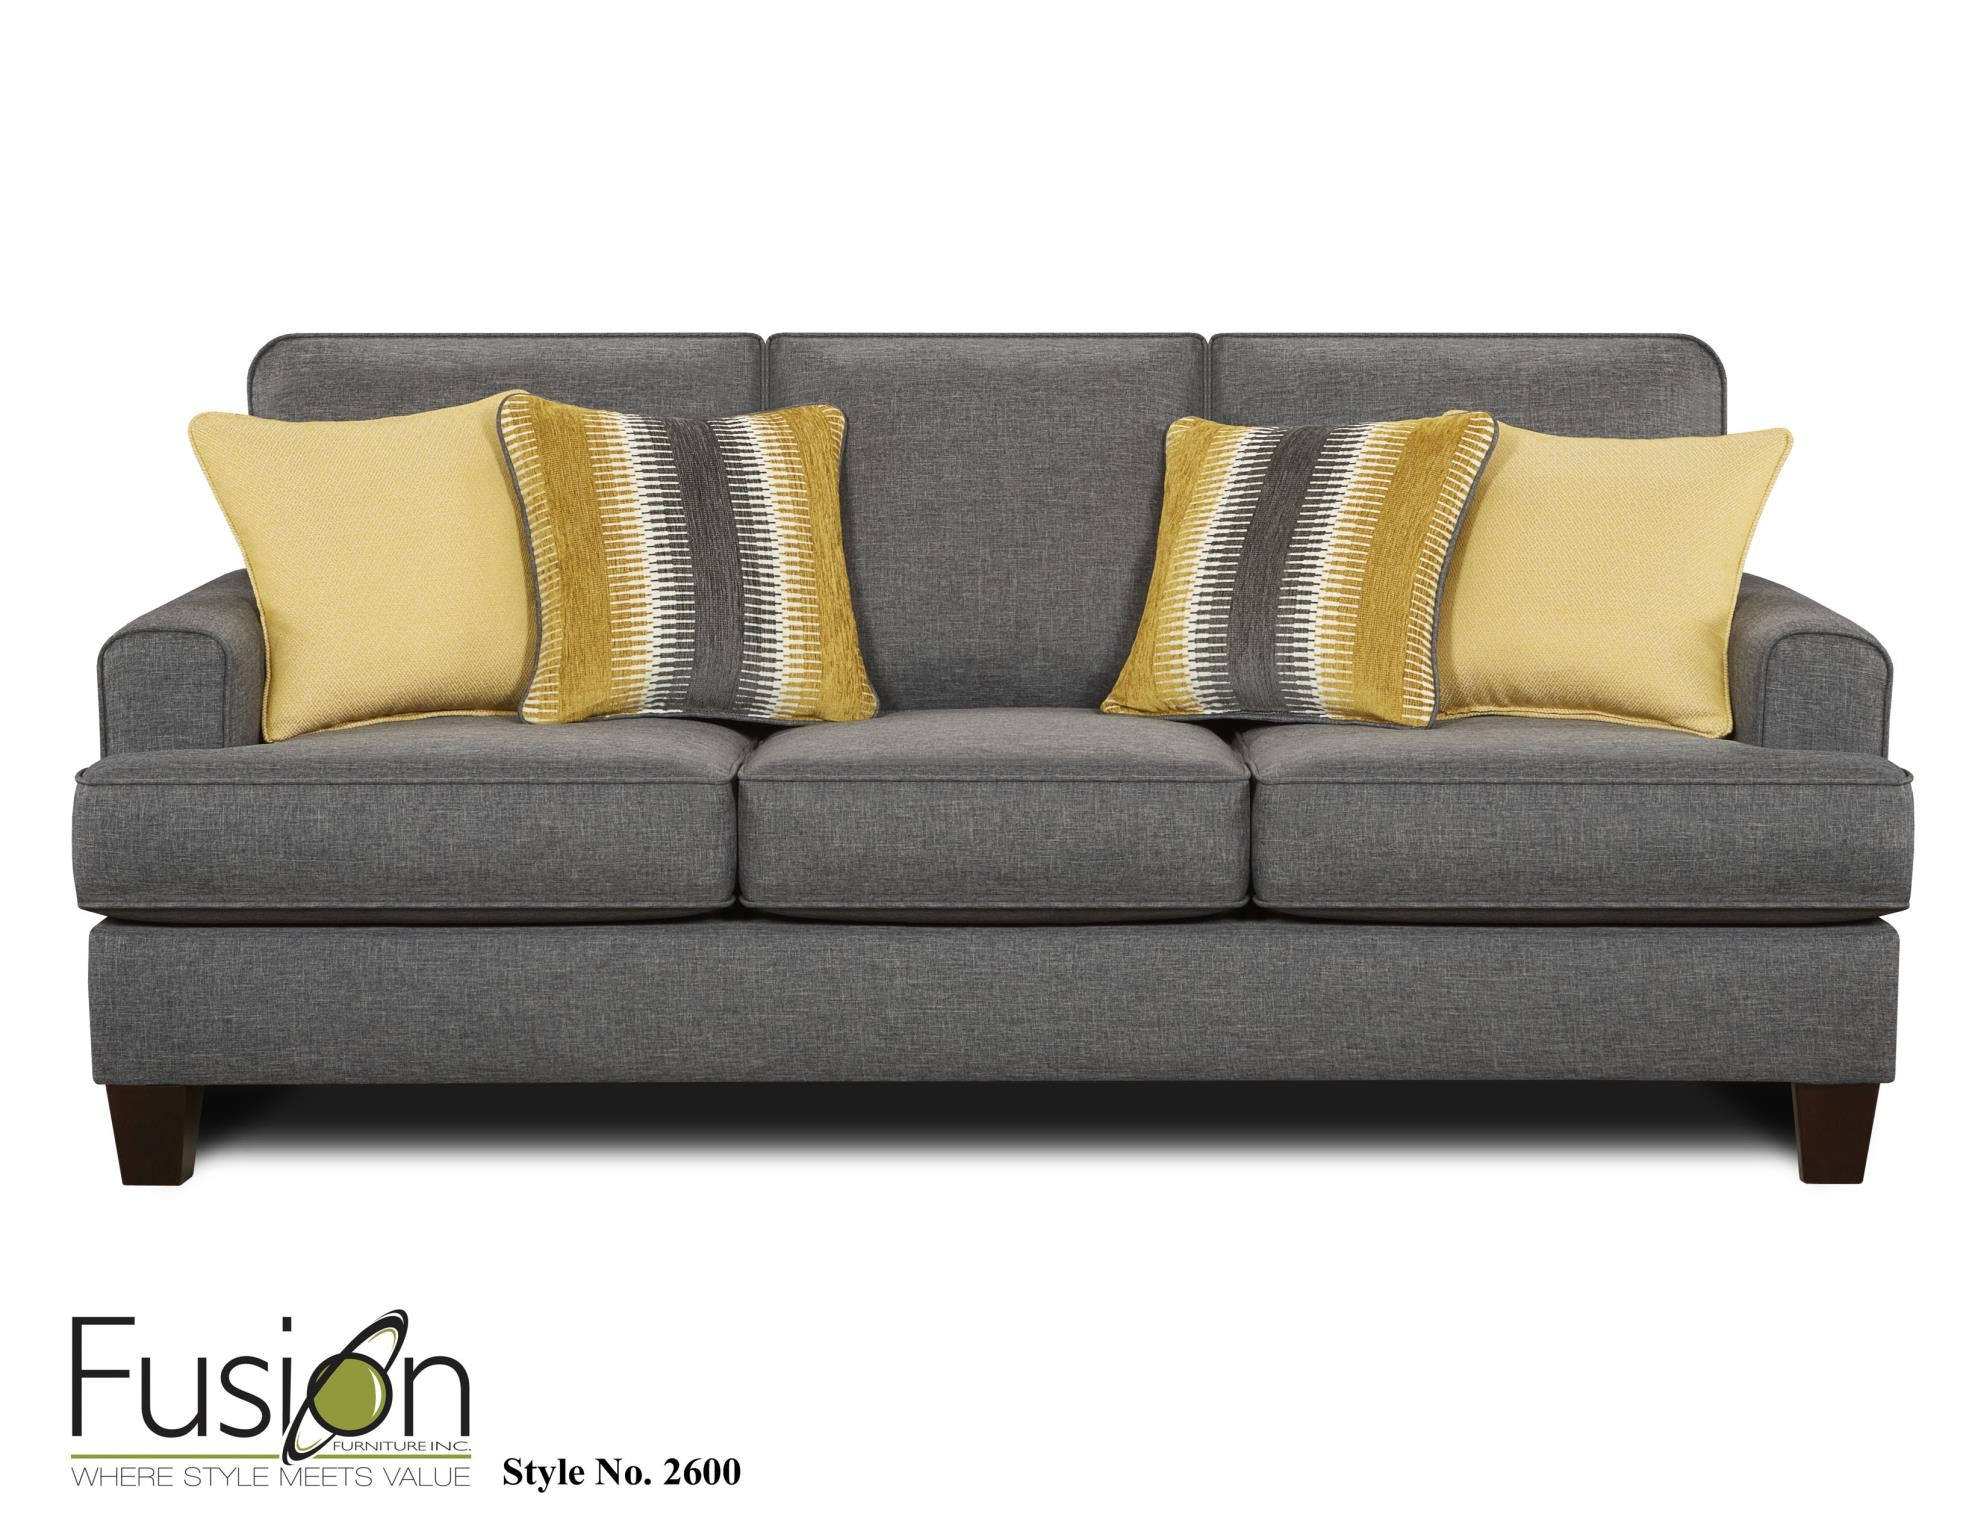 Fusion Living Room Sofa Sleeper 2604Maxwell Gray   FurnitureLand   Delmar,  Delaware